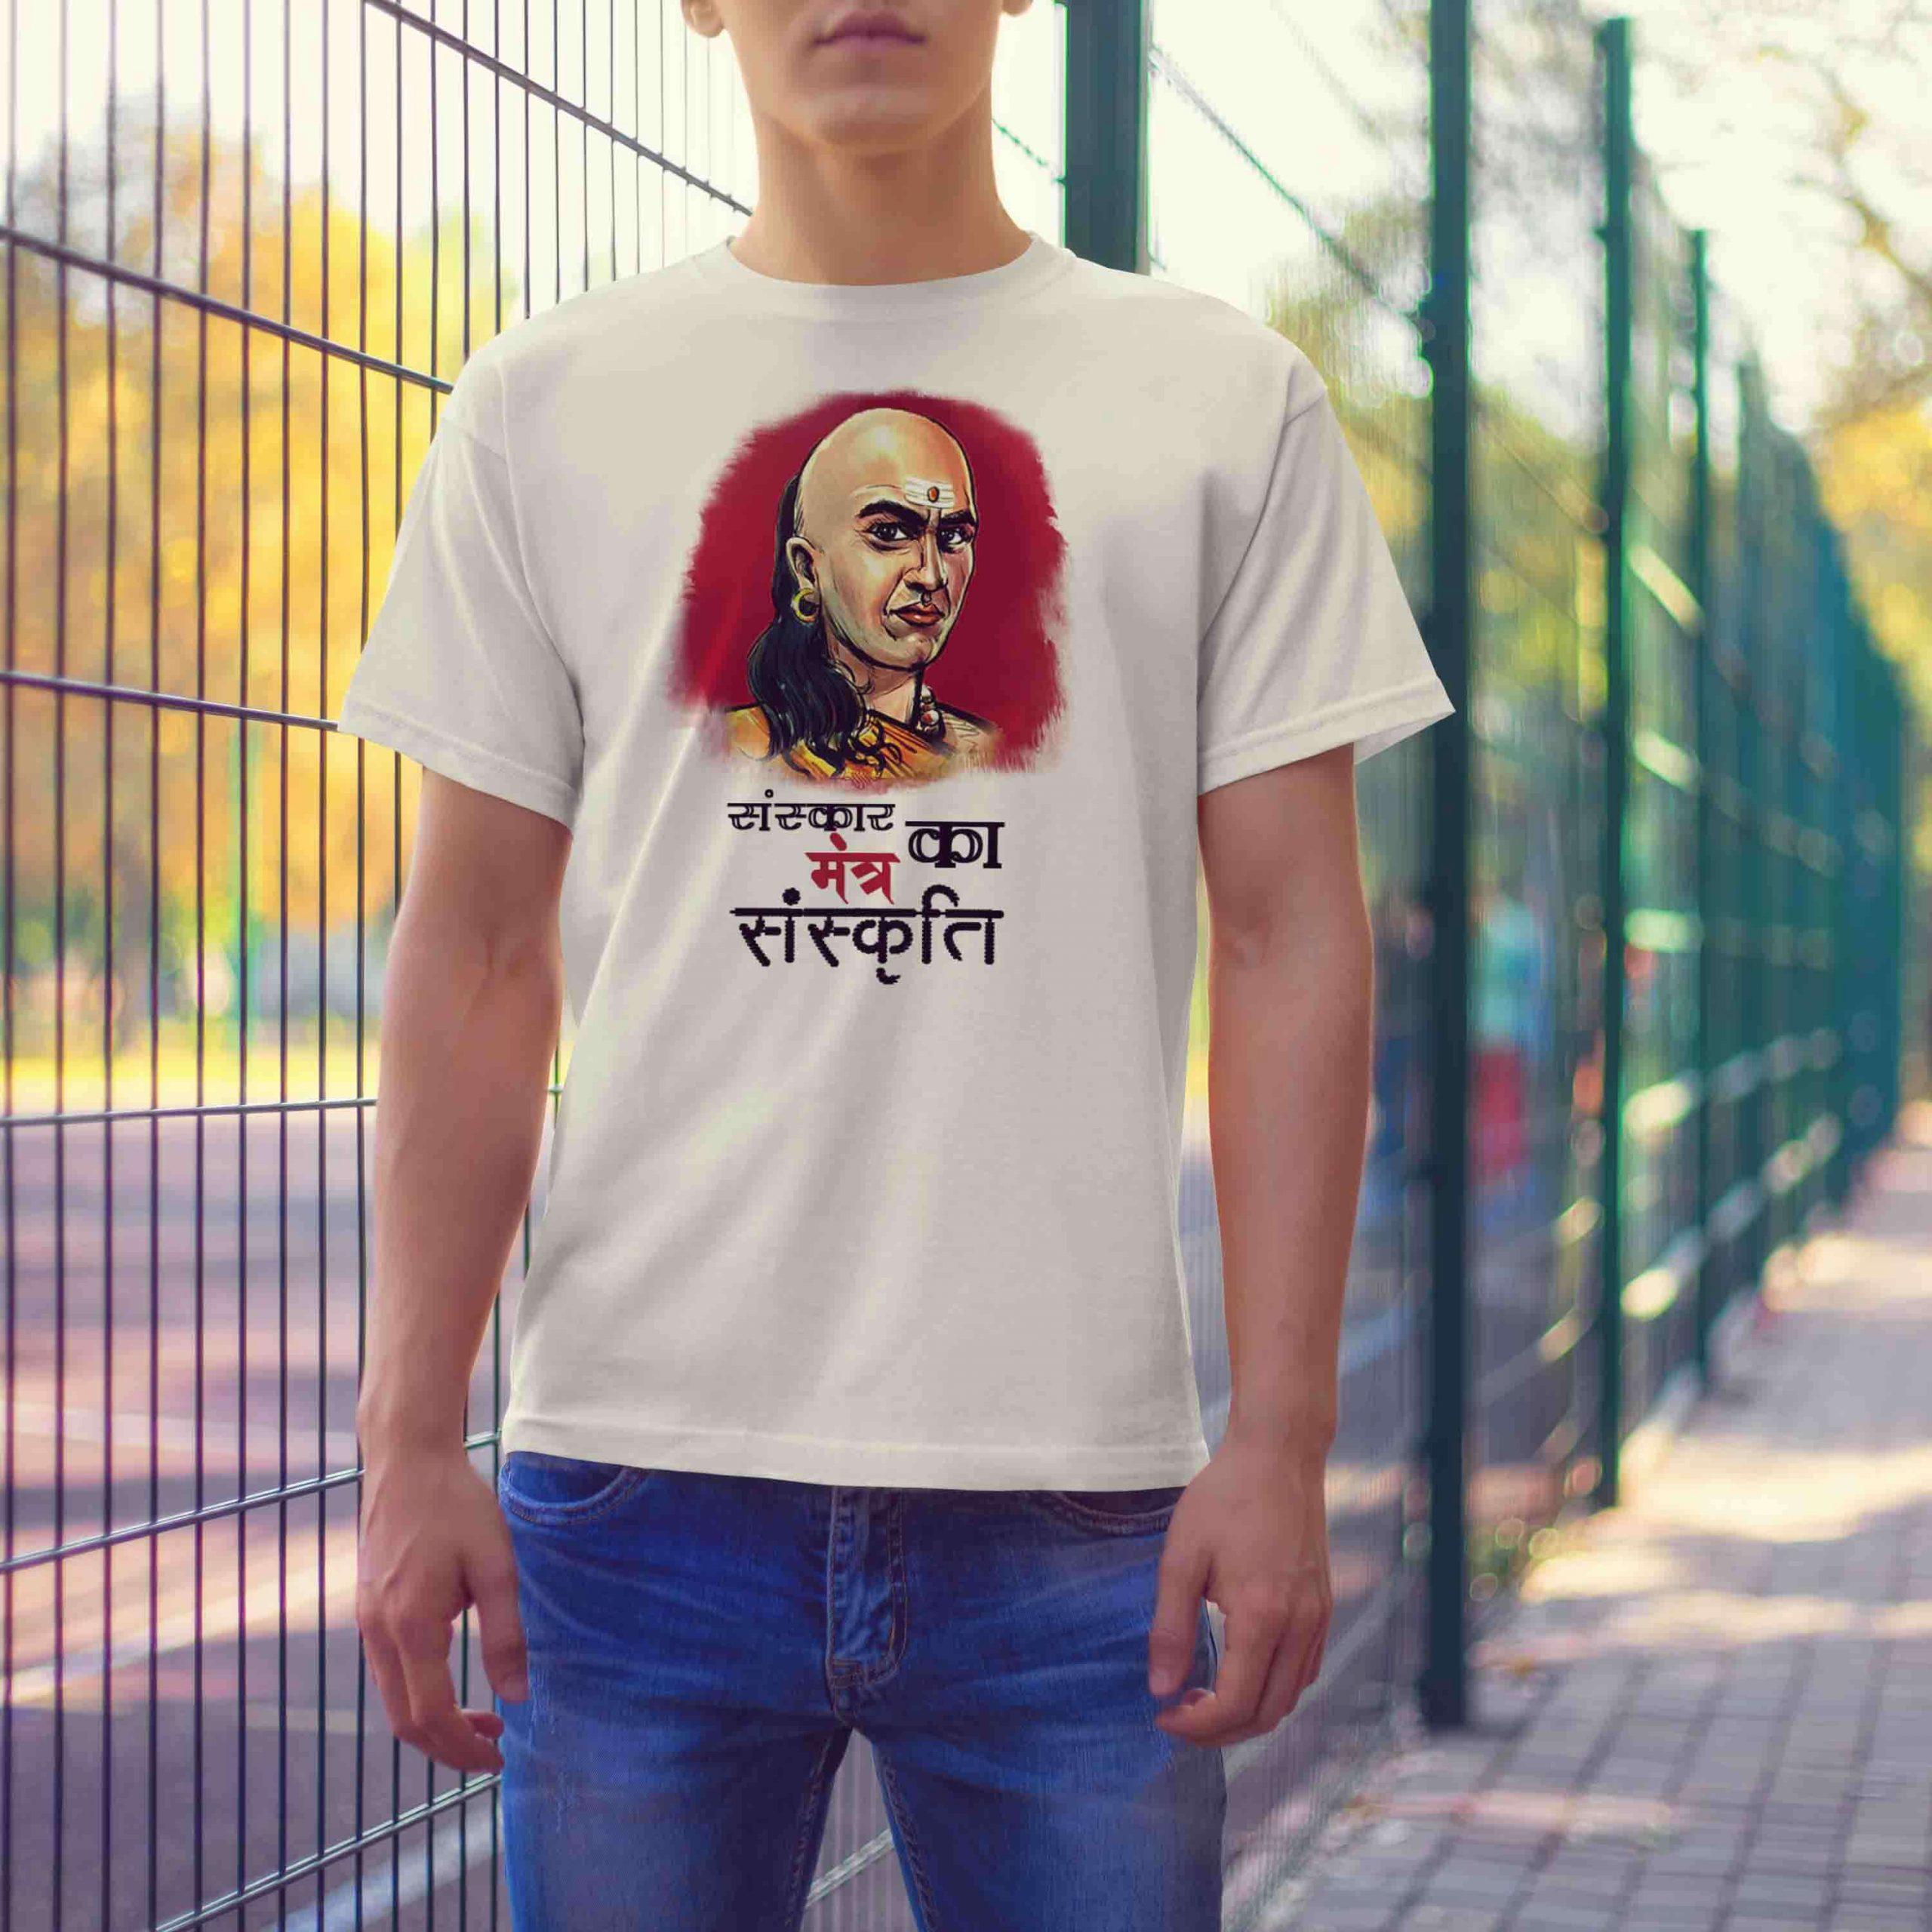 Chankya niti quotes printed half sleeve t shirt for men